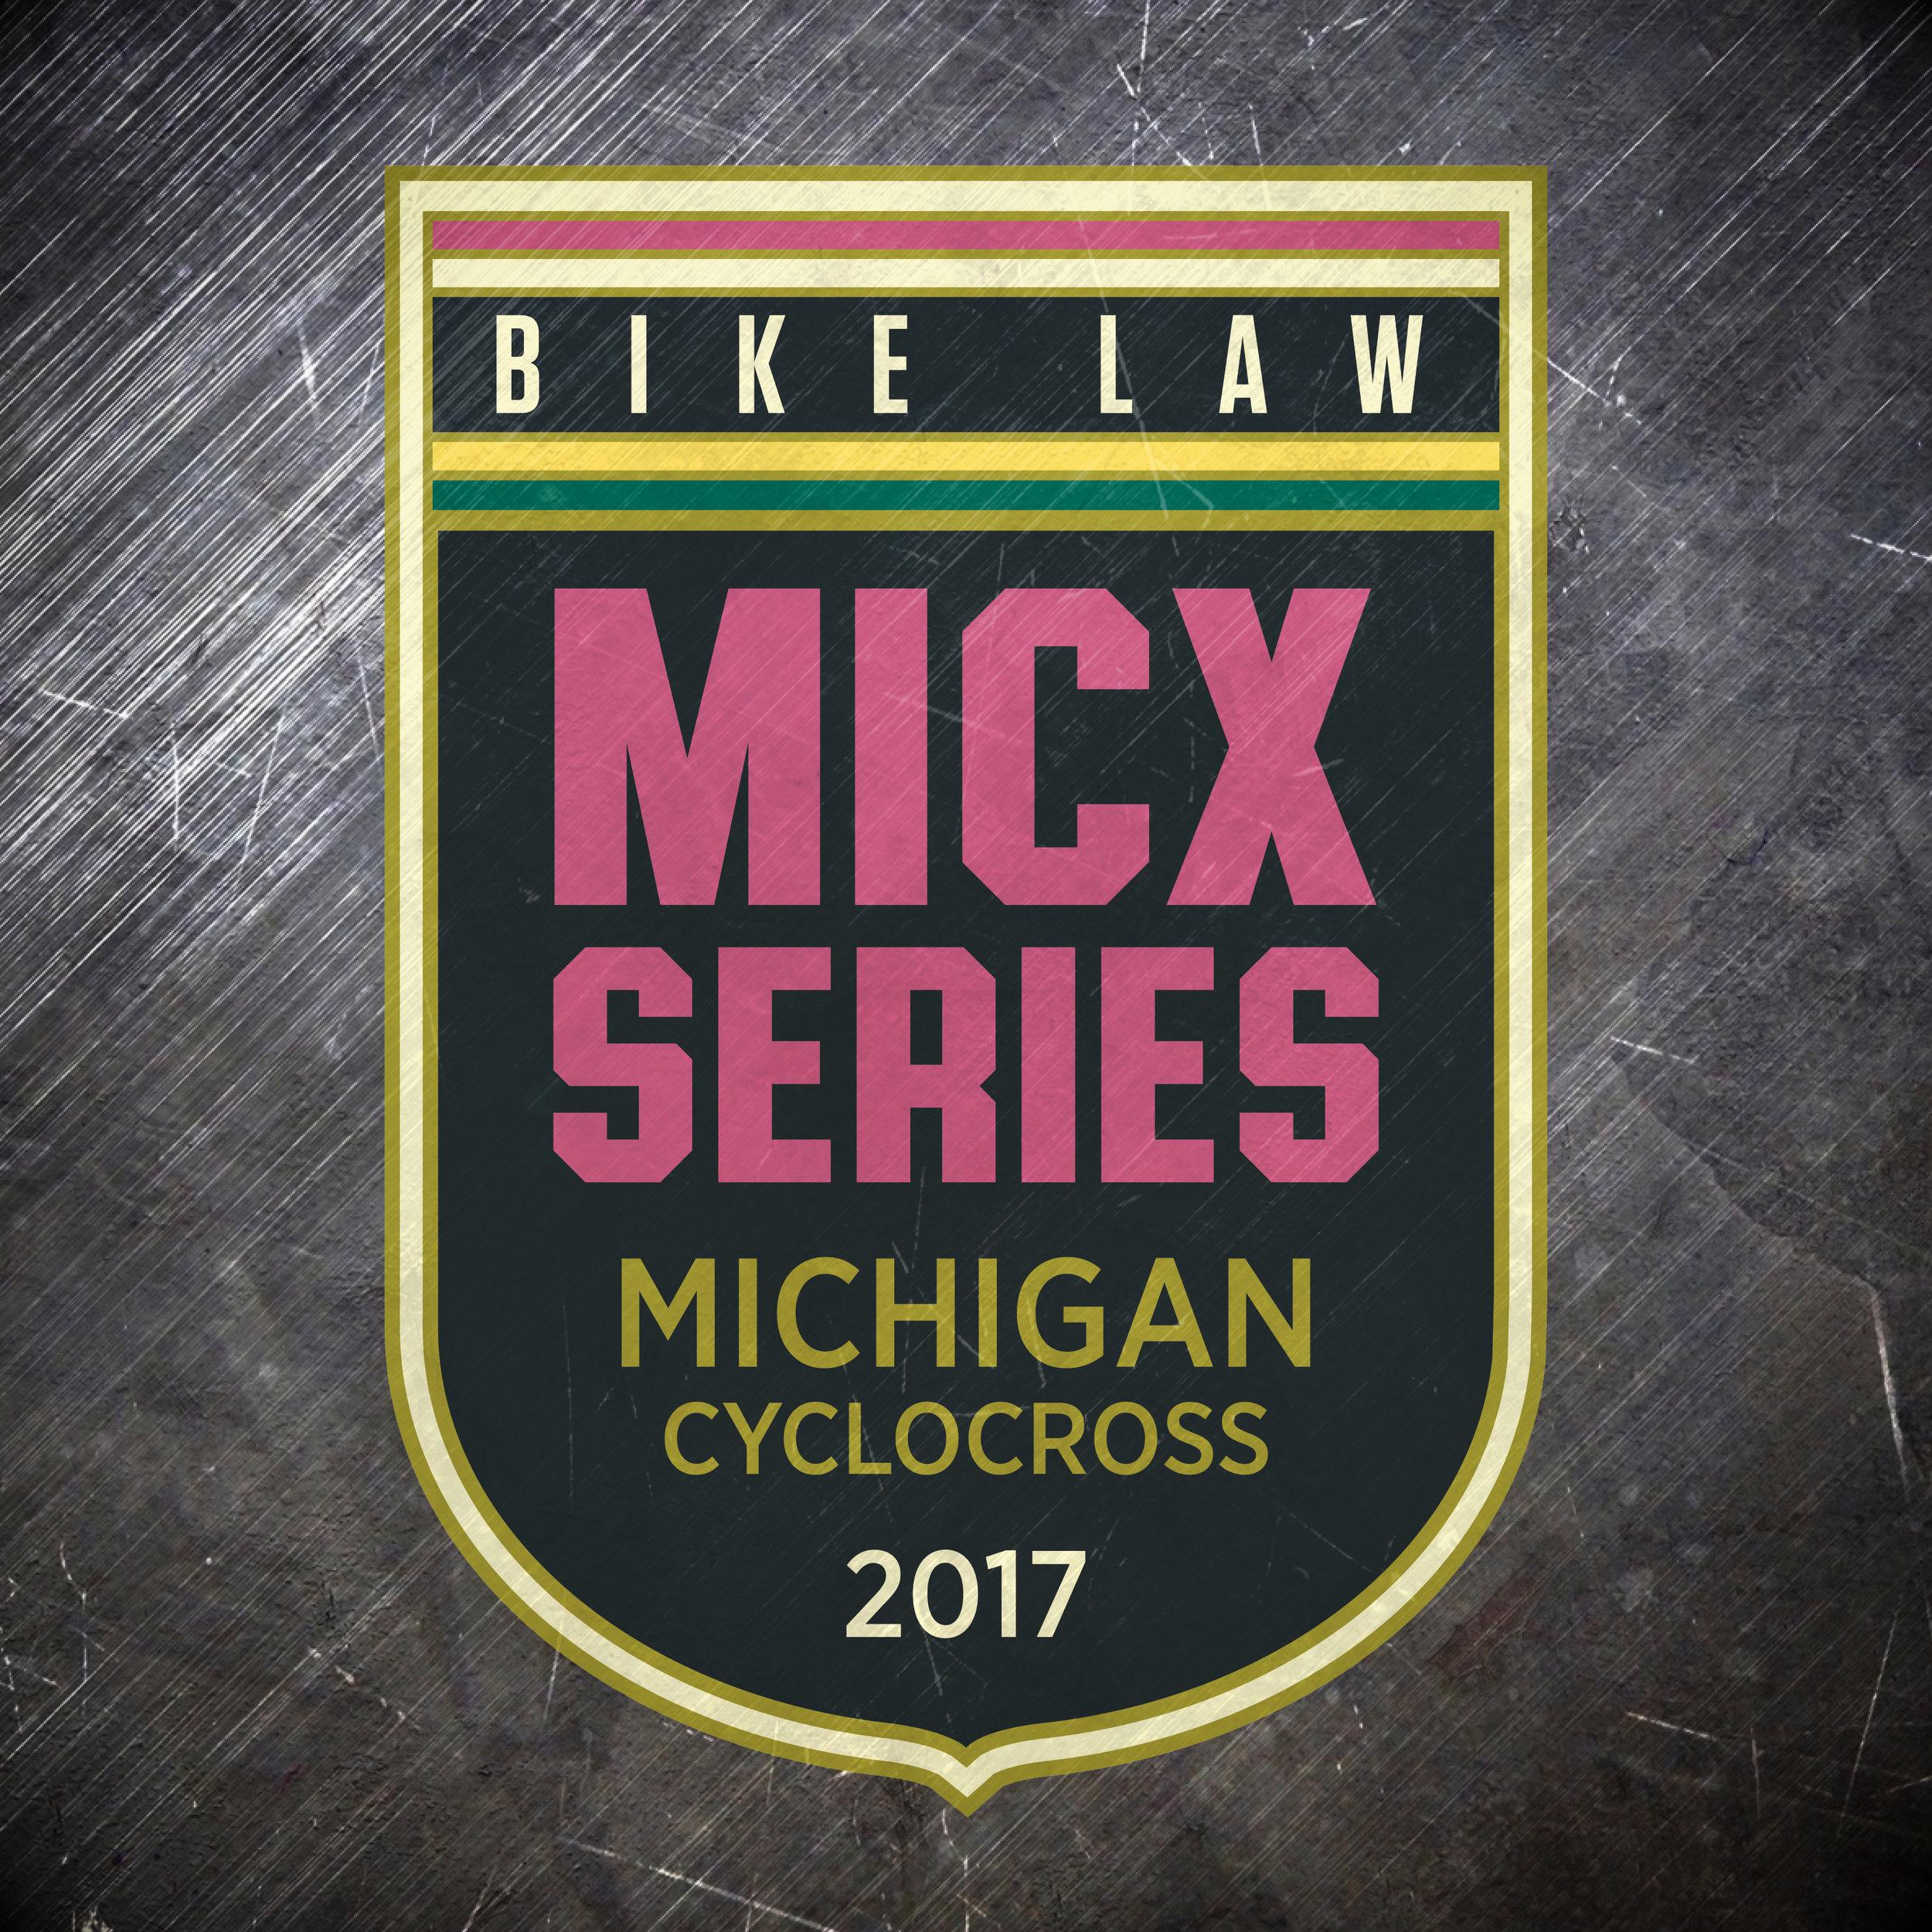 MICX2017Final_Expanded-01 copy.jpg